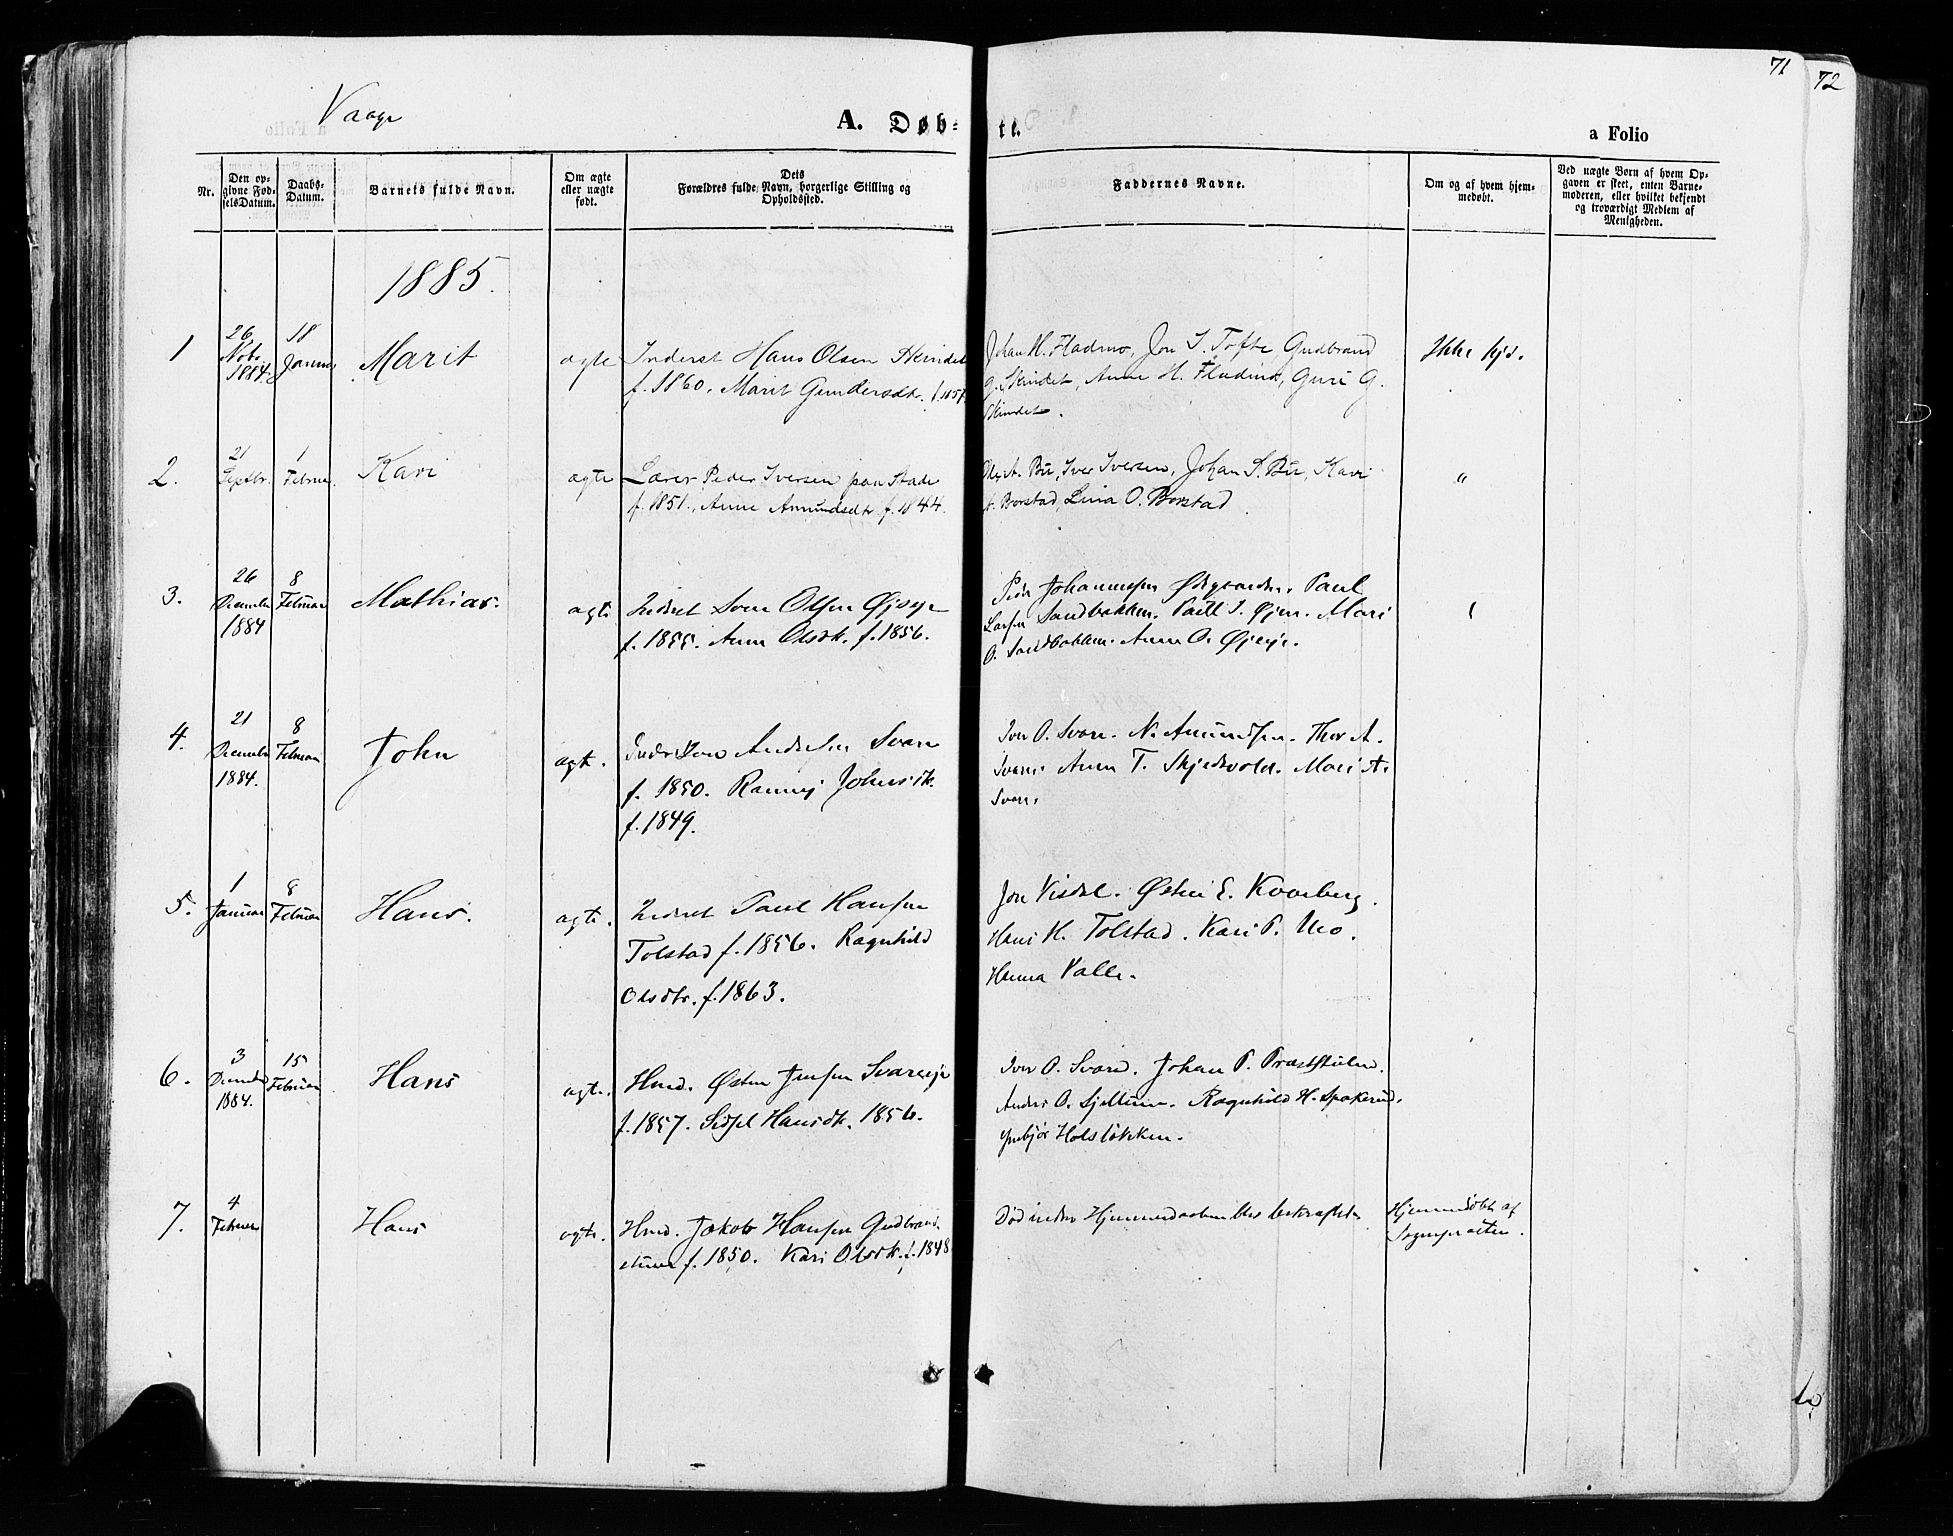 SAH, Vågå prestekontor, Ministerialbok nr. 7 /1, 1872-1886, s. 71